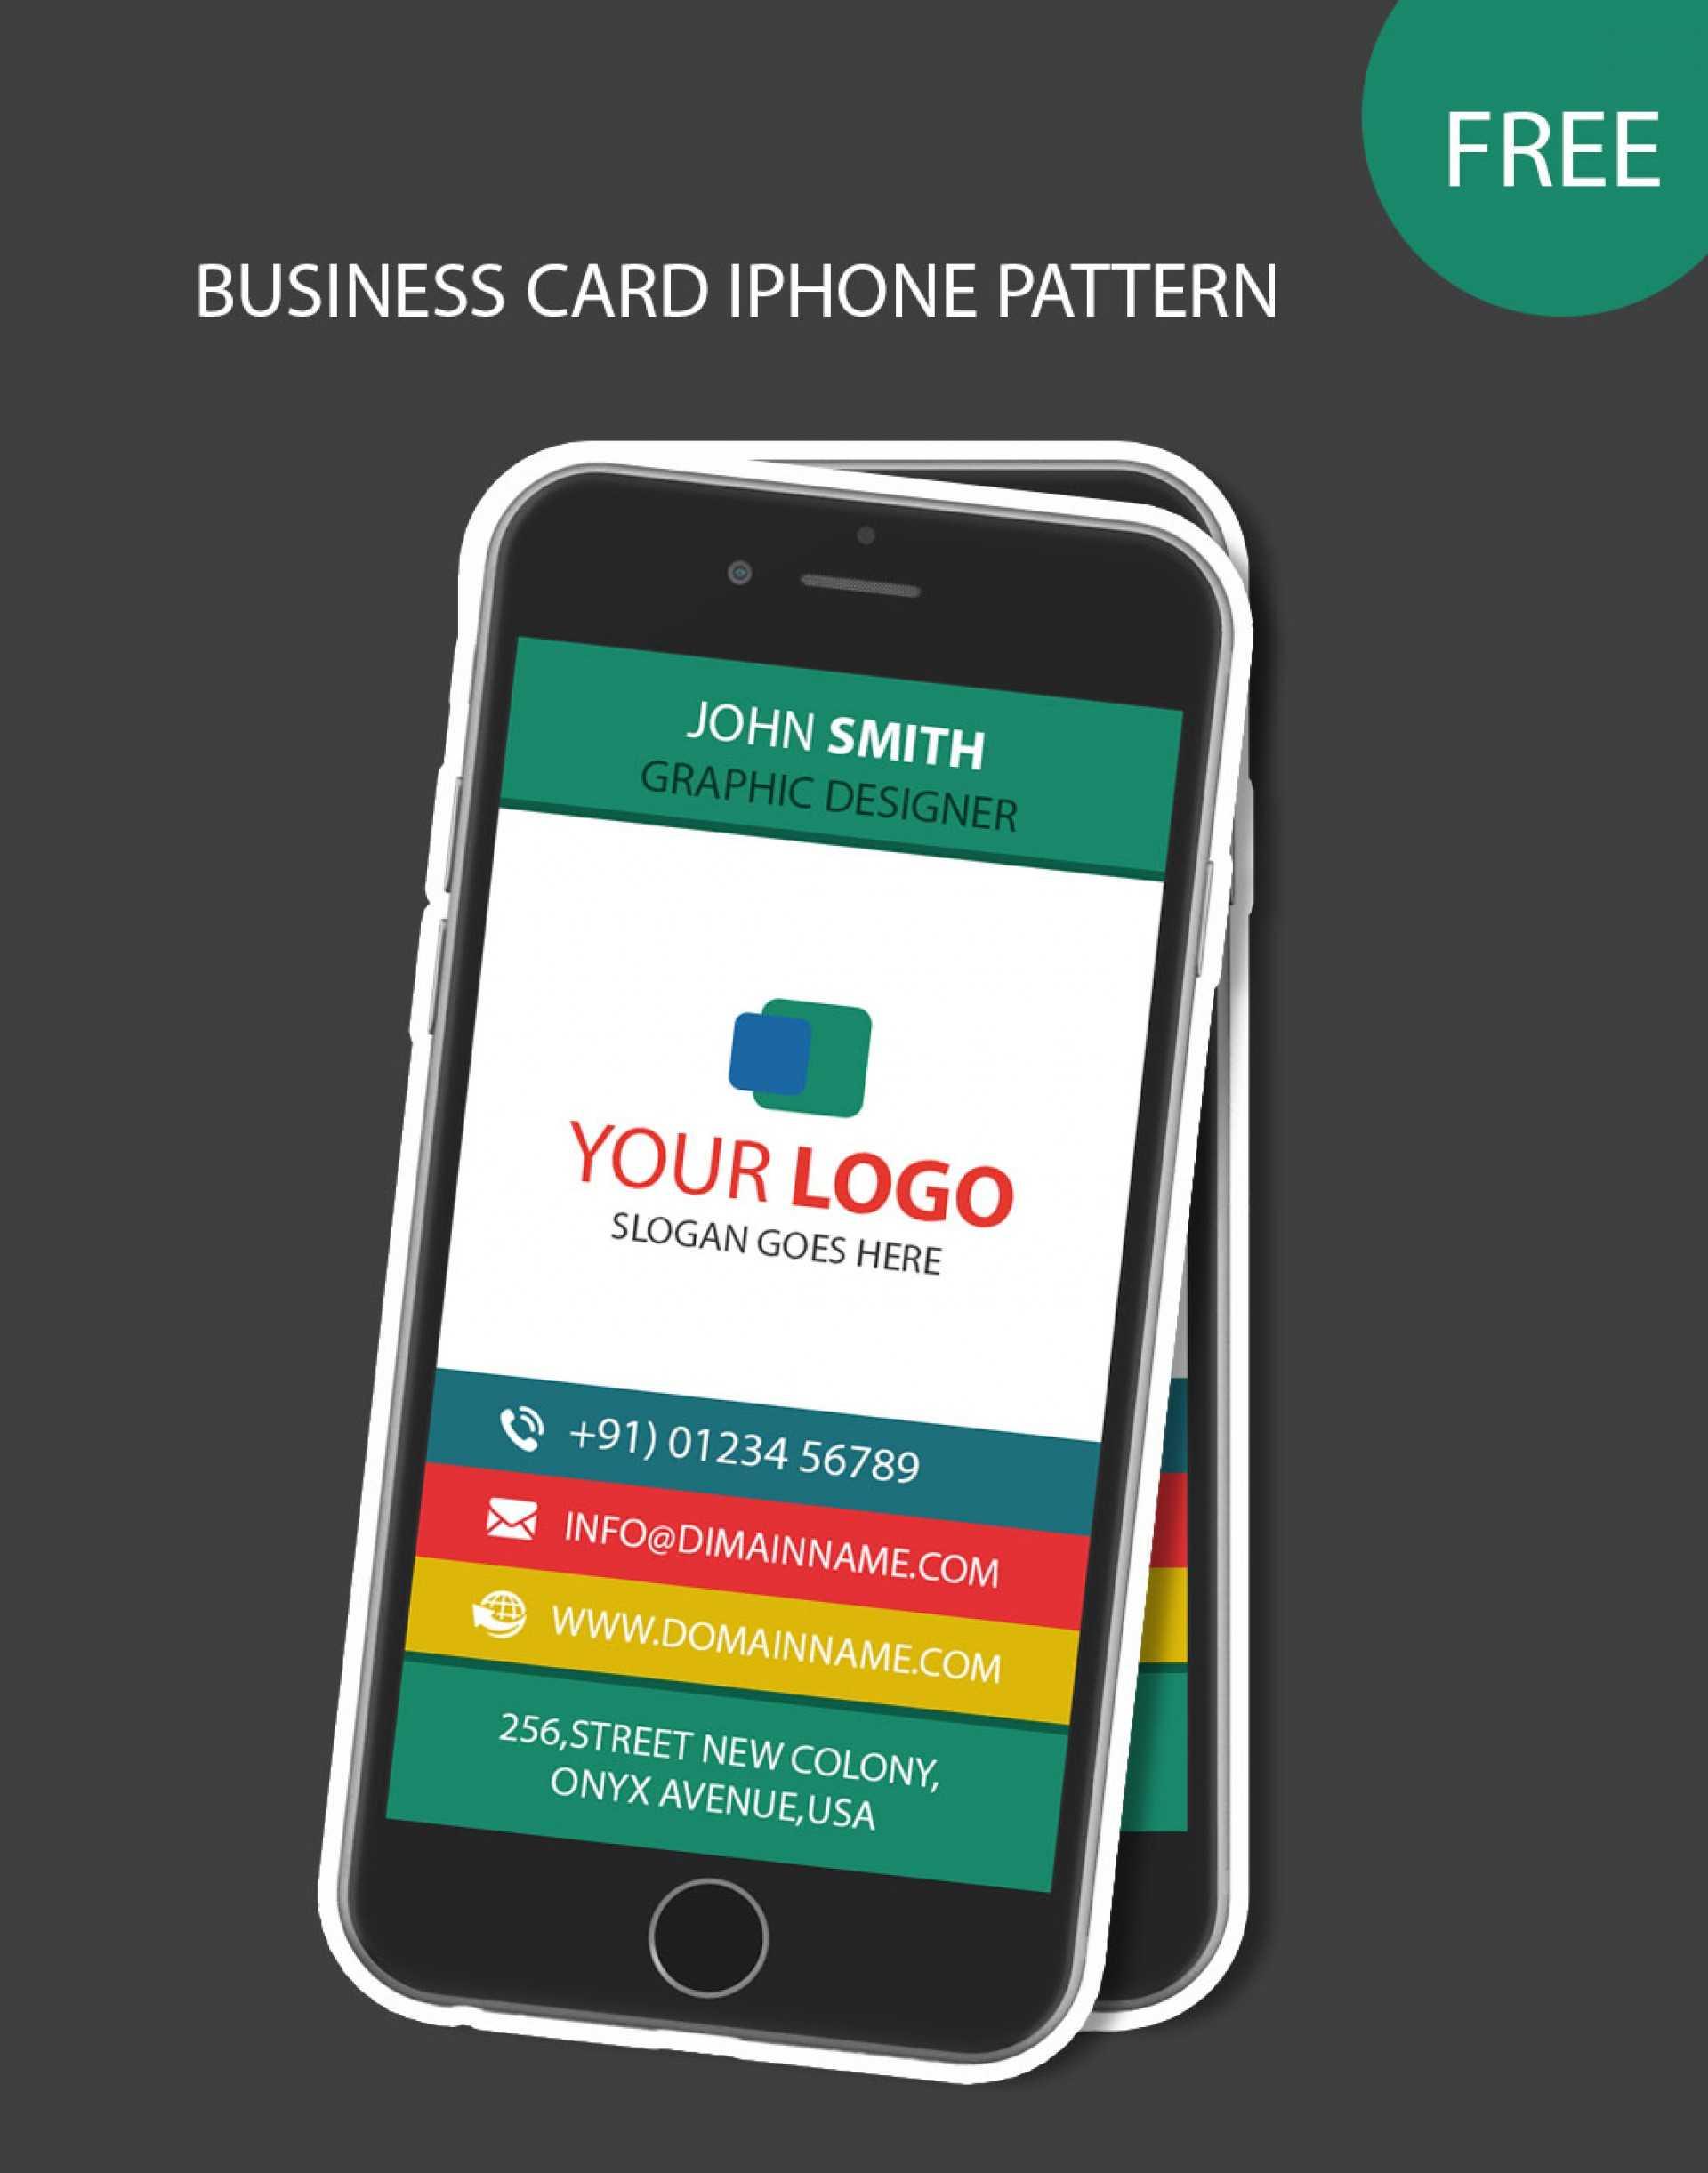 006 Iphone Business Card Template Unusual Ideas Free Psd Throughout Iphone Business Card Template